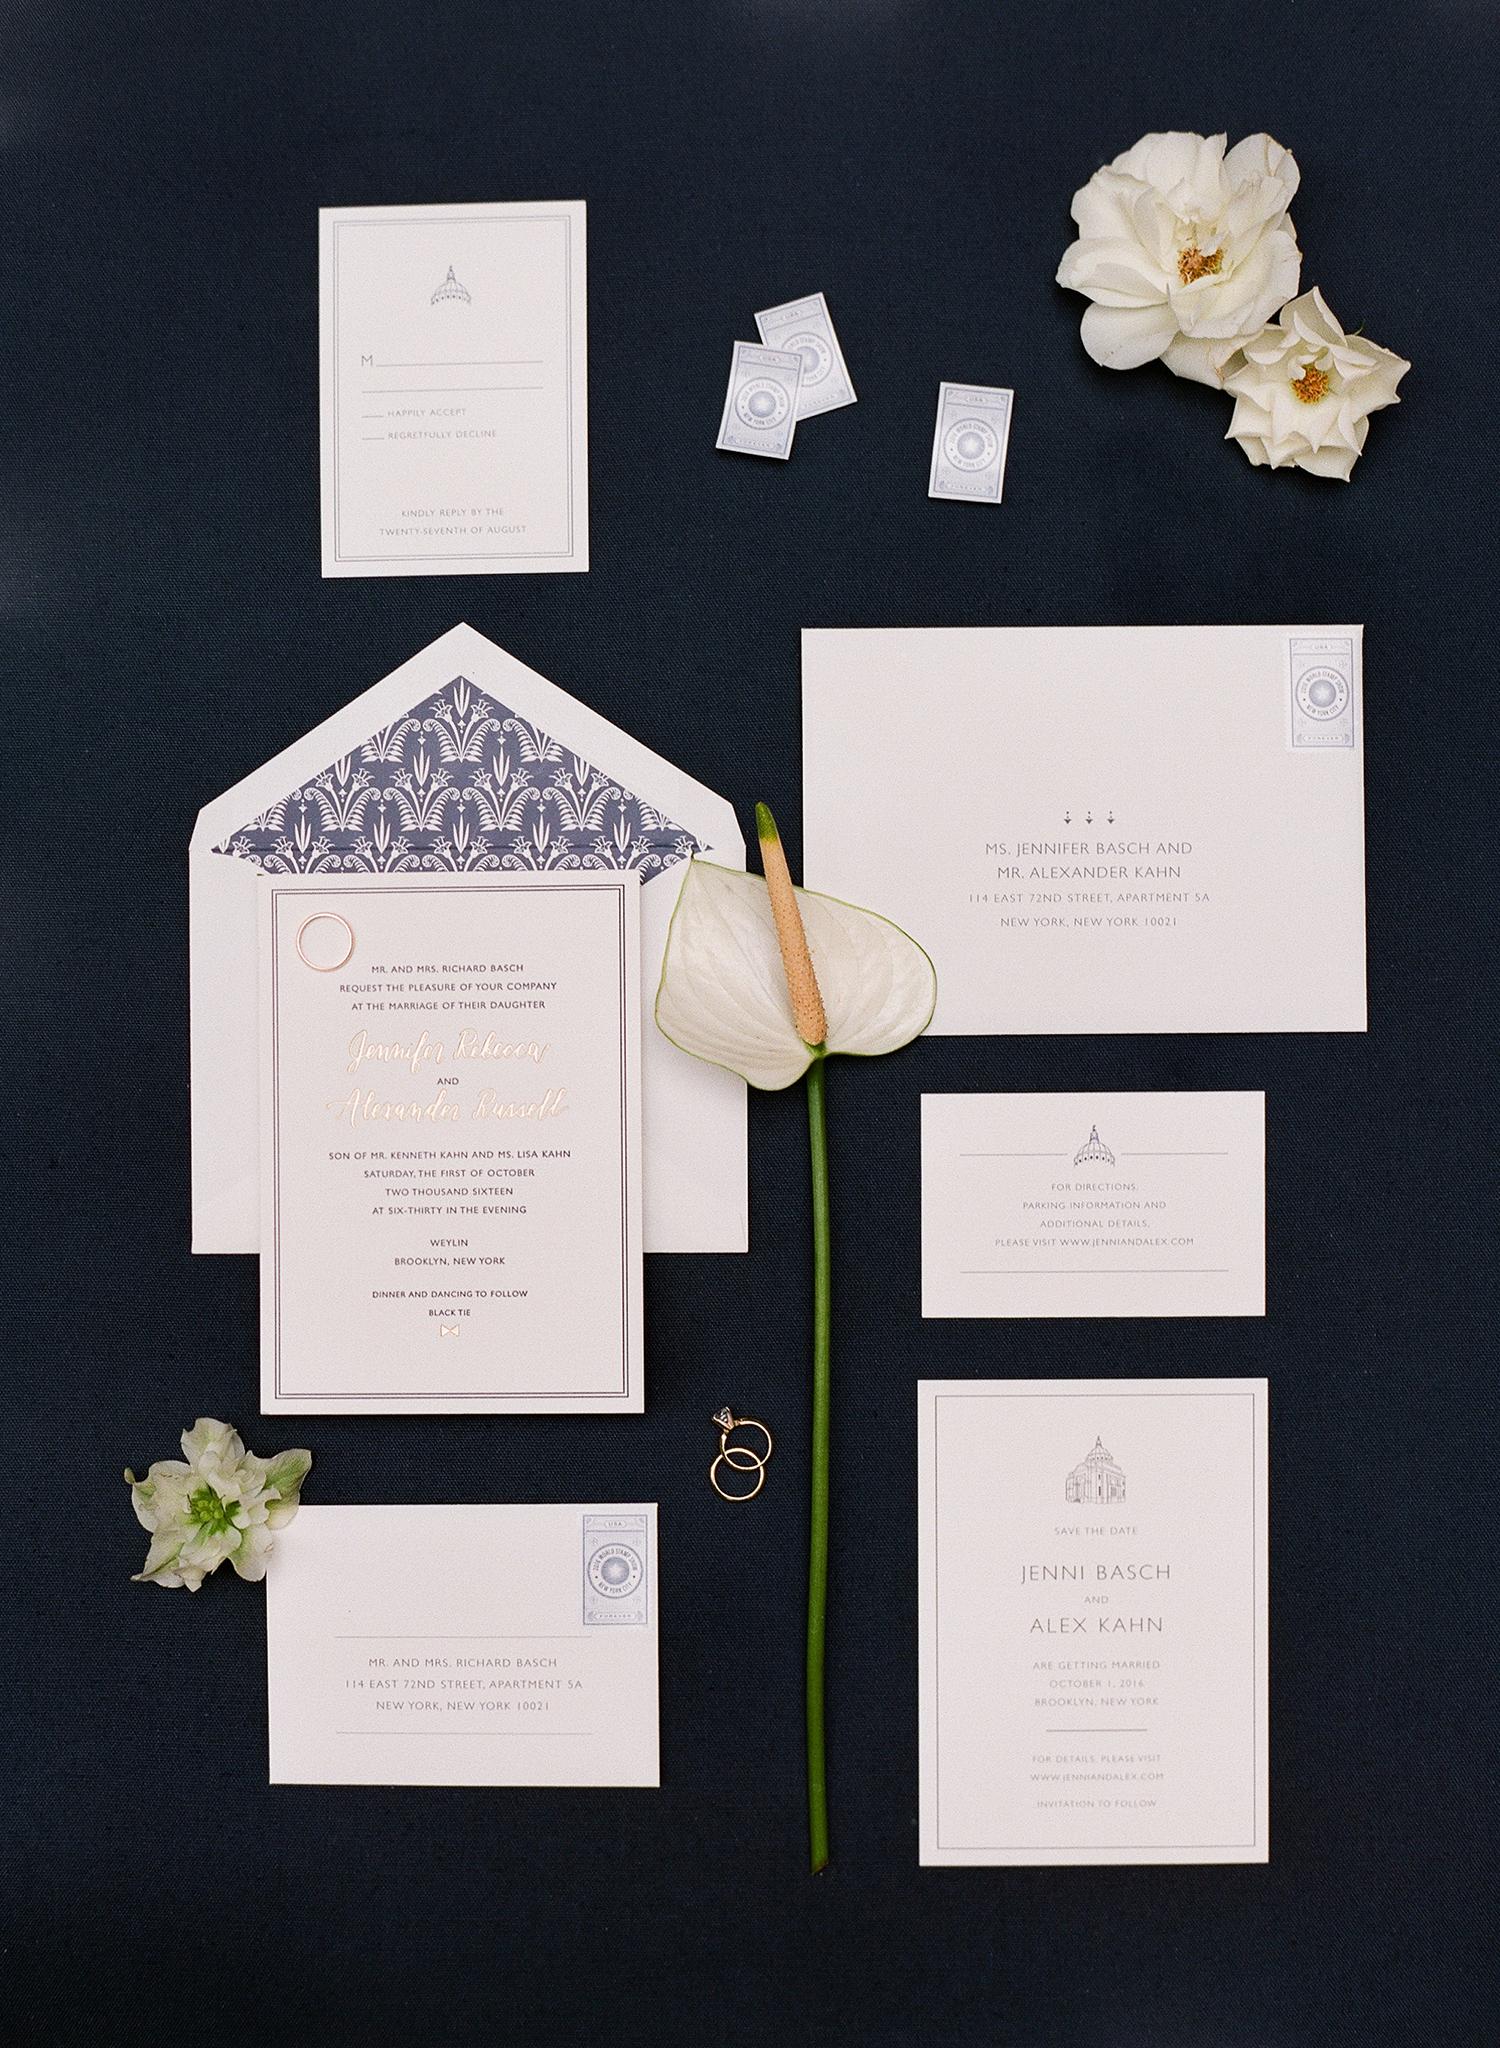 Fourteen-Forty-Heather-Waraksa-New-York-City-Pratt-House-Wedding0001.jpg